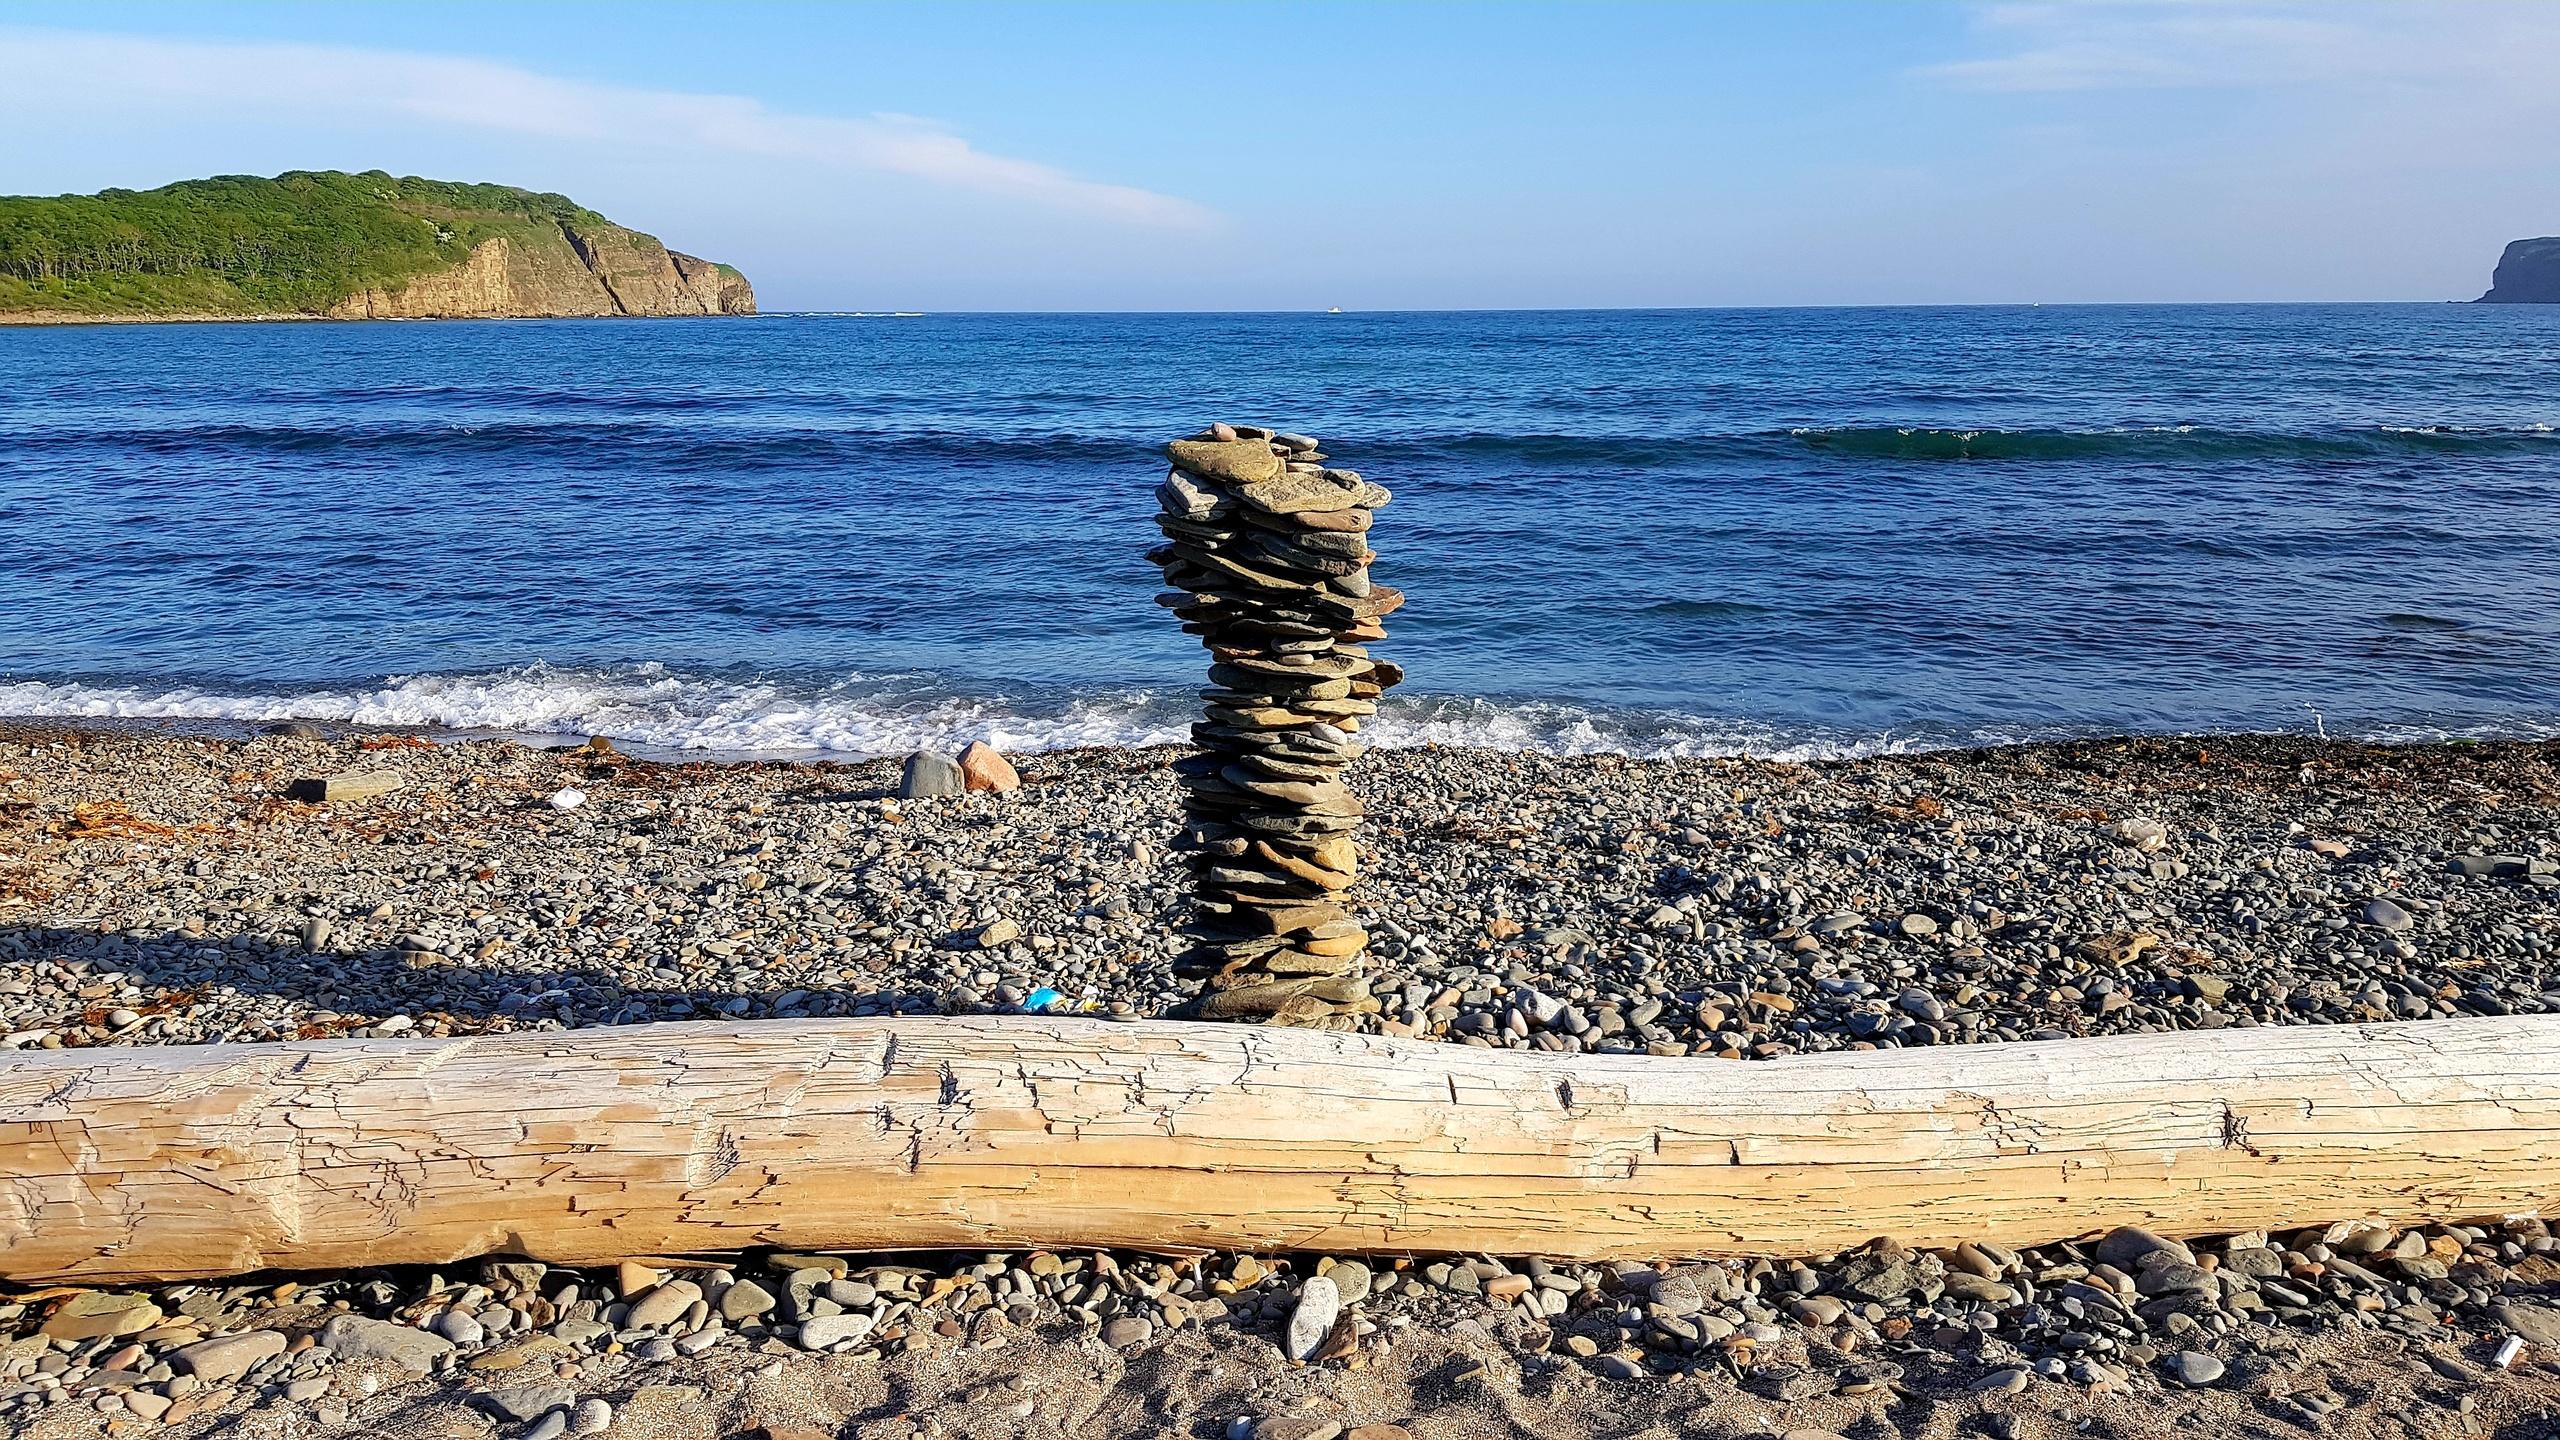 весна, май, море, природа, красиво, пейзаж, остров русский, приморский край, владивосток